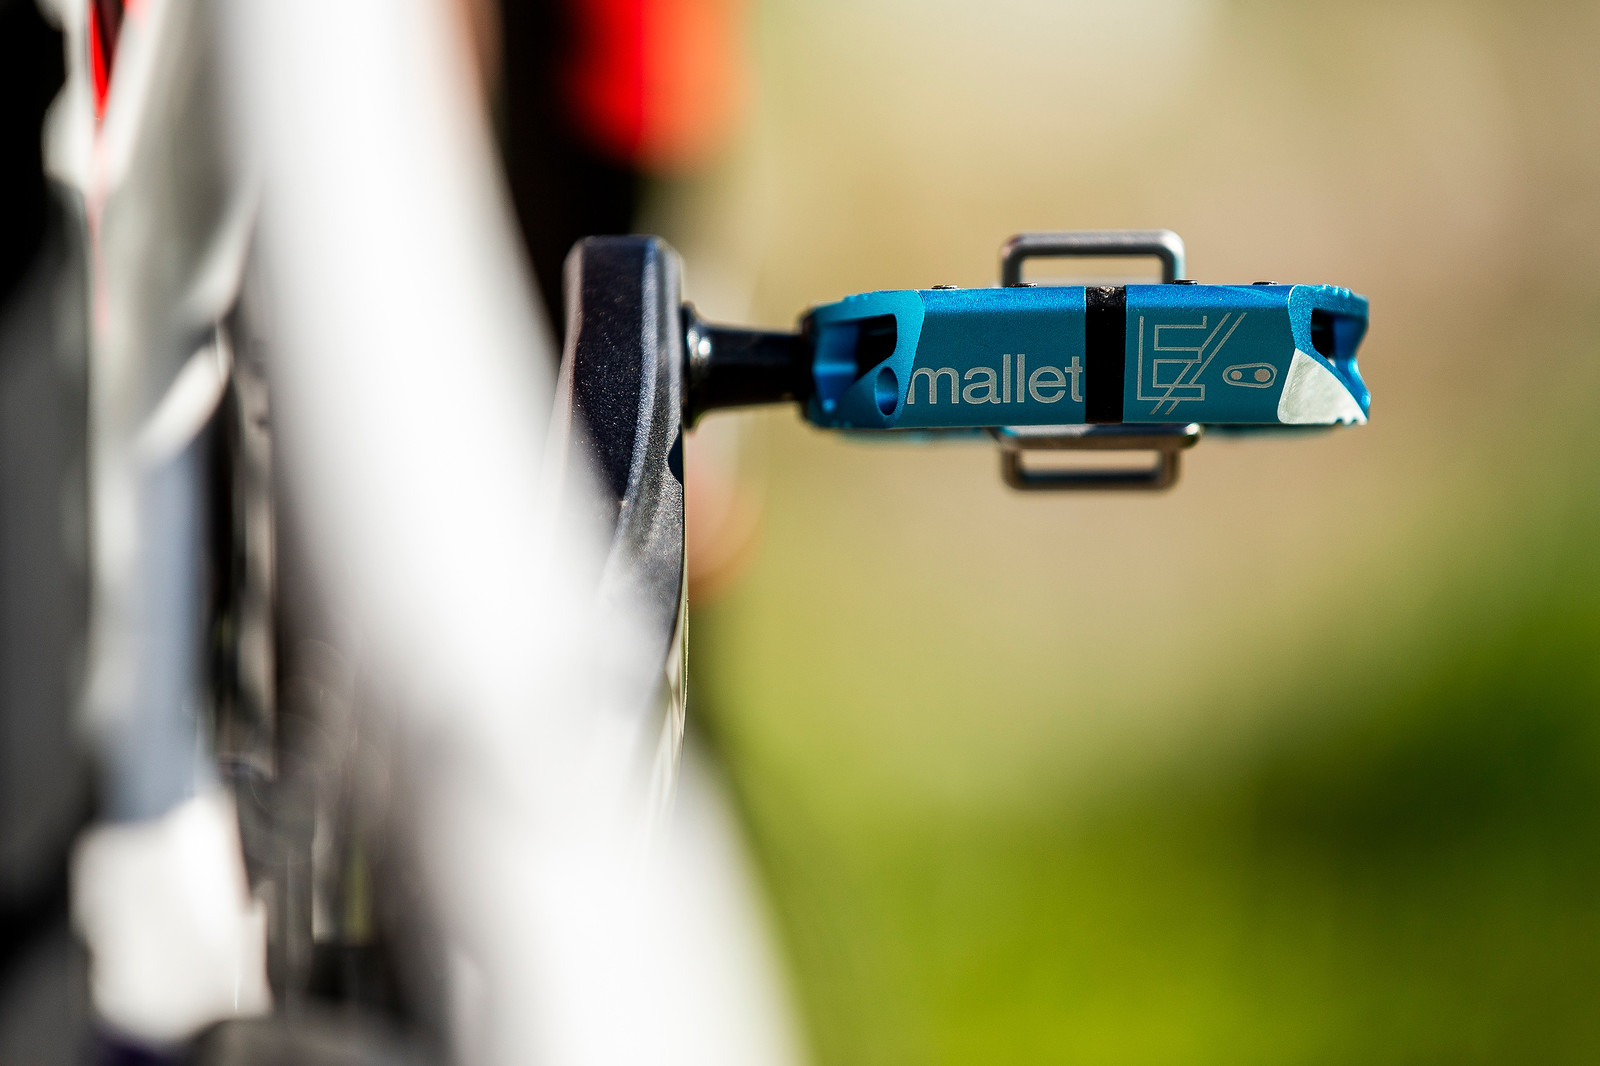 Crankbrothers Mallets - WORLD CHAMPS BIKE - Danny Hart's Saracen Myst - Mountain Biking Pictures - Vital MTB